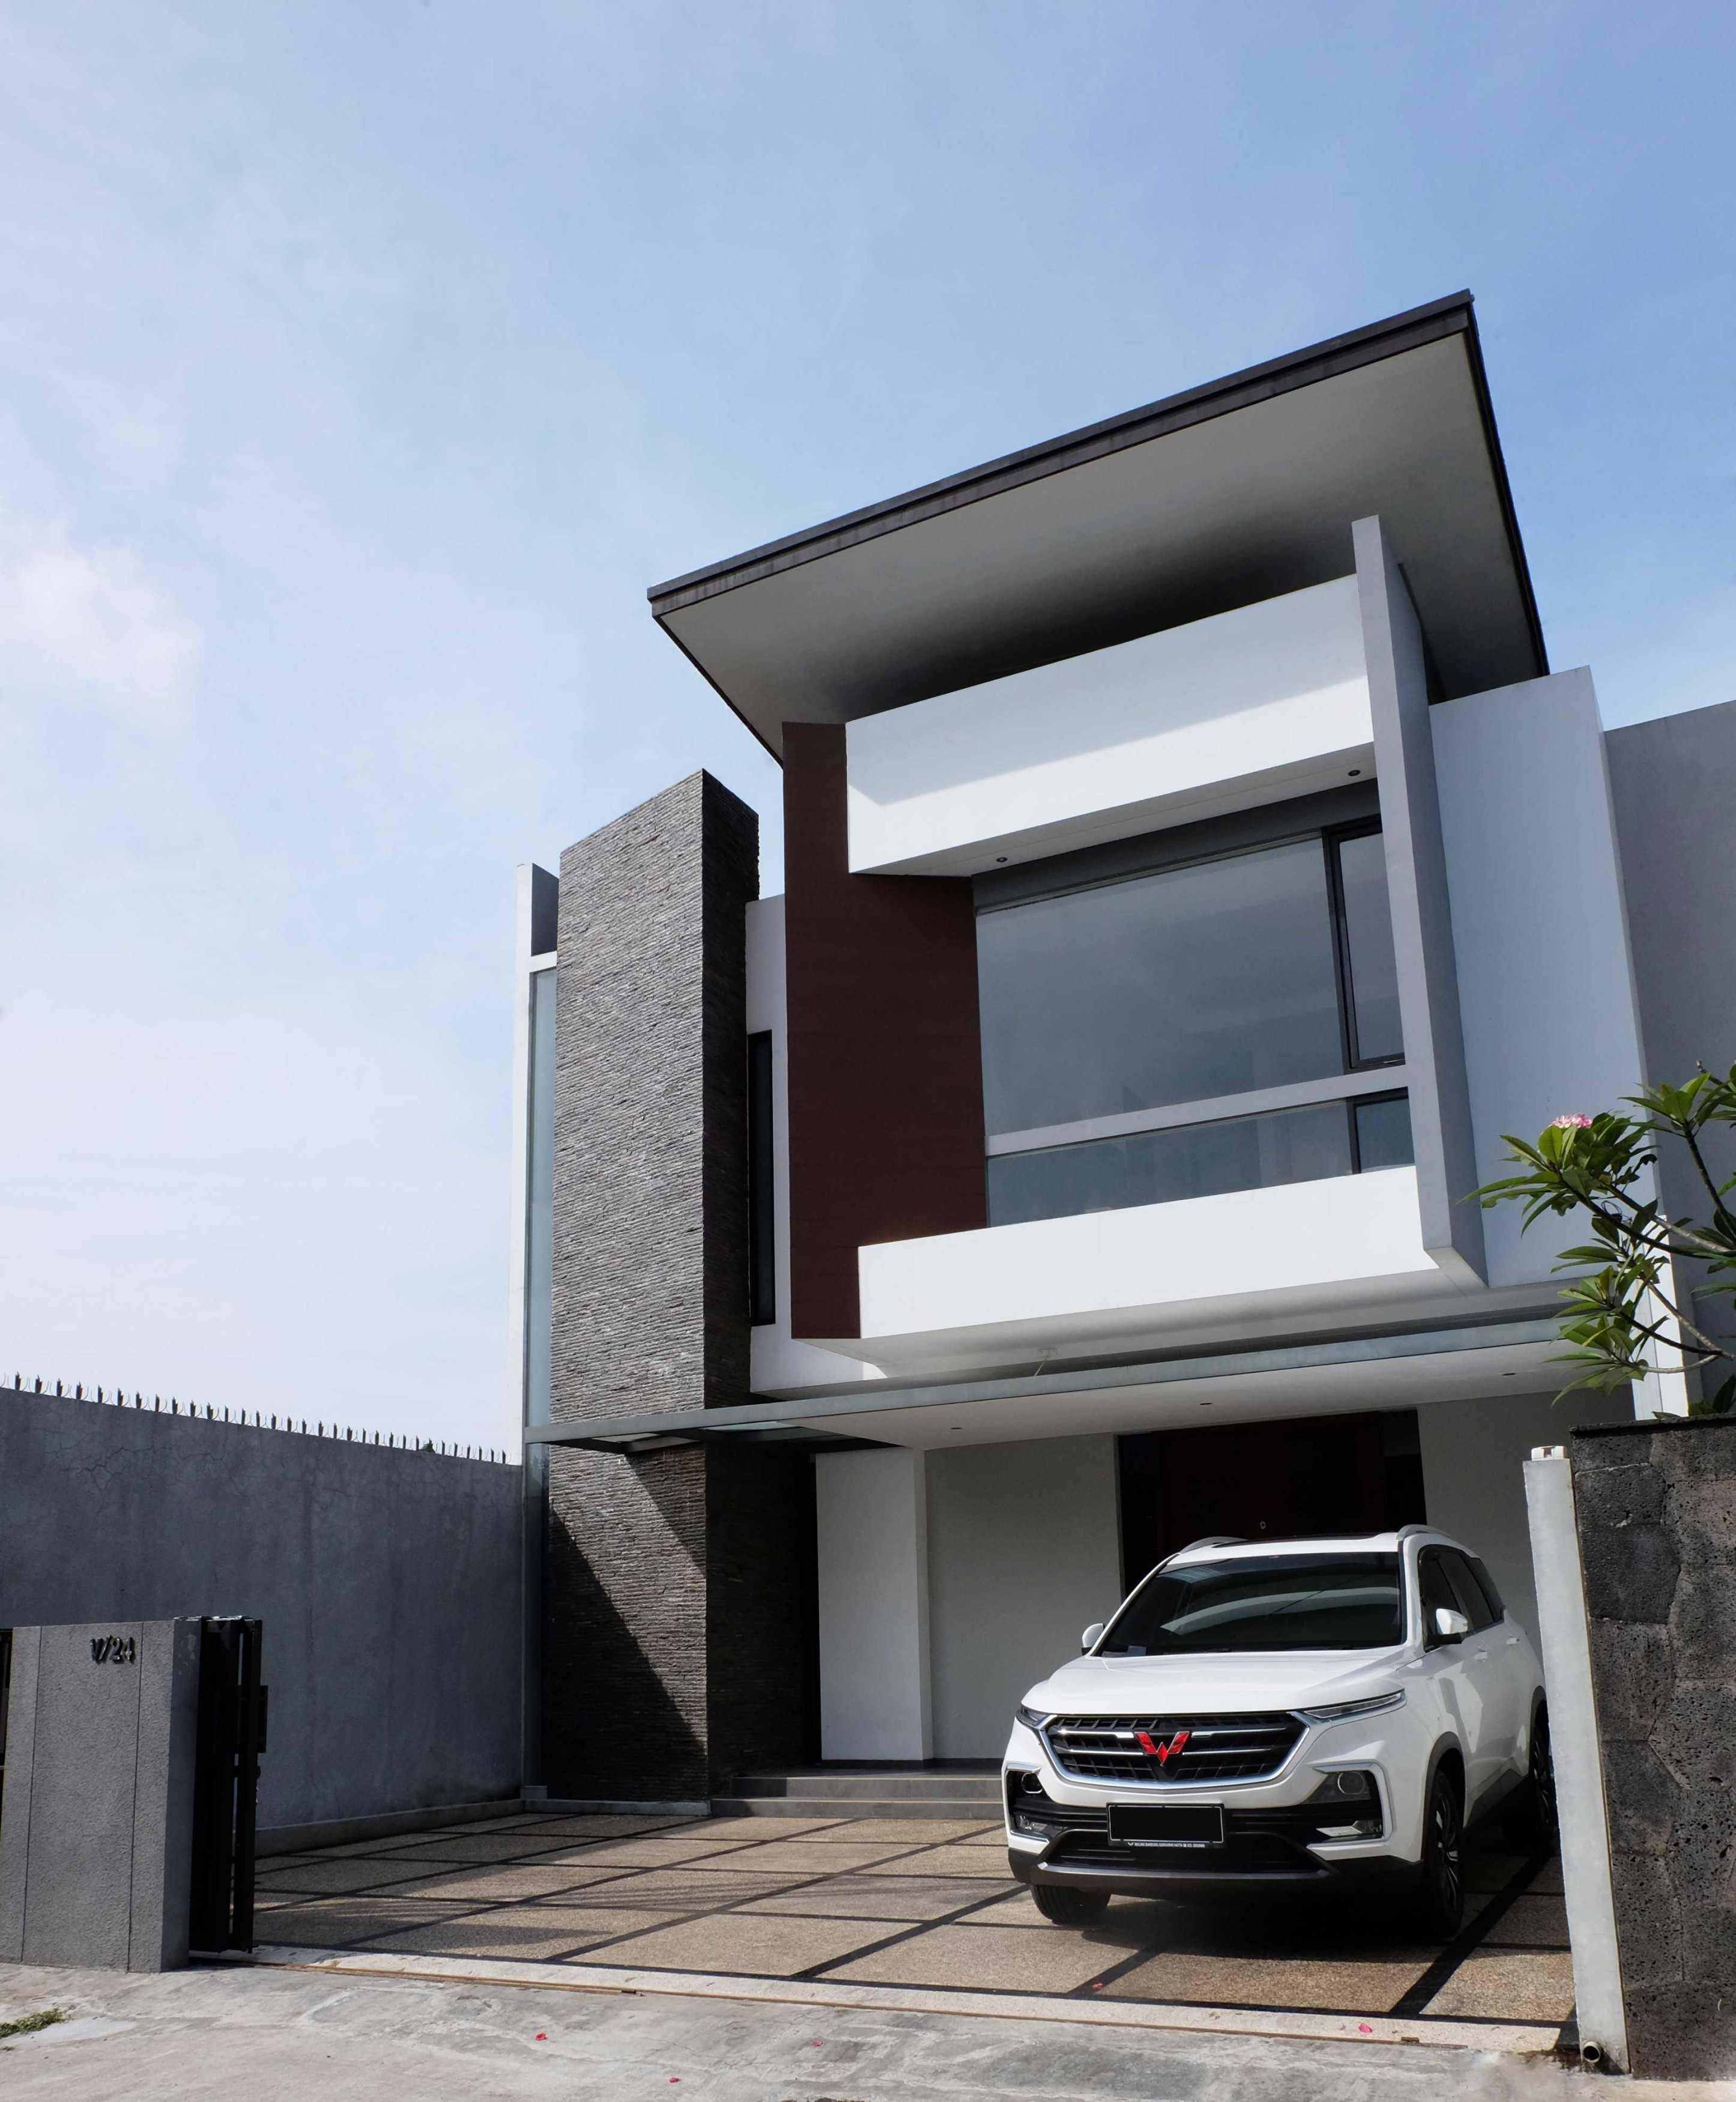 Kamitata Rd - House Bandung, Kota Bandung, Jawa Barat, Indonesia Bandung, Kota Bandung, Jawa Barat, Indonesia Kamitata-Rd-House   94718